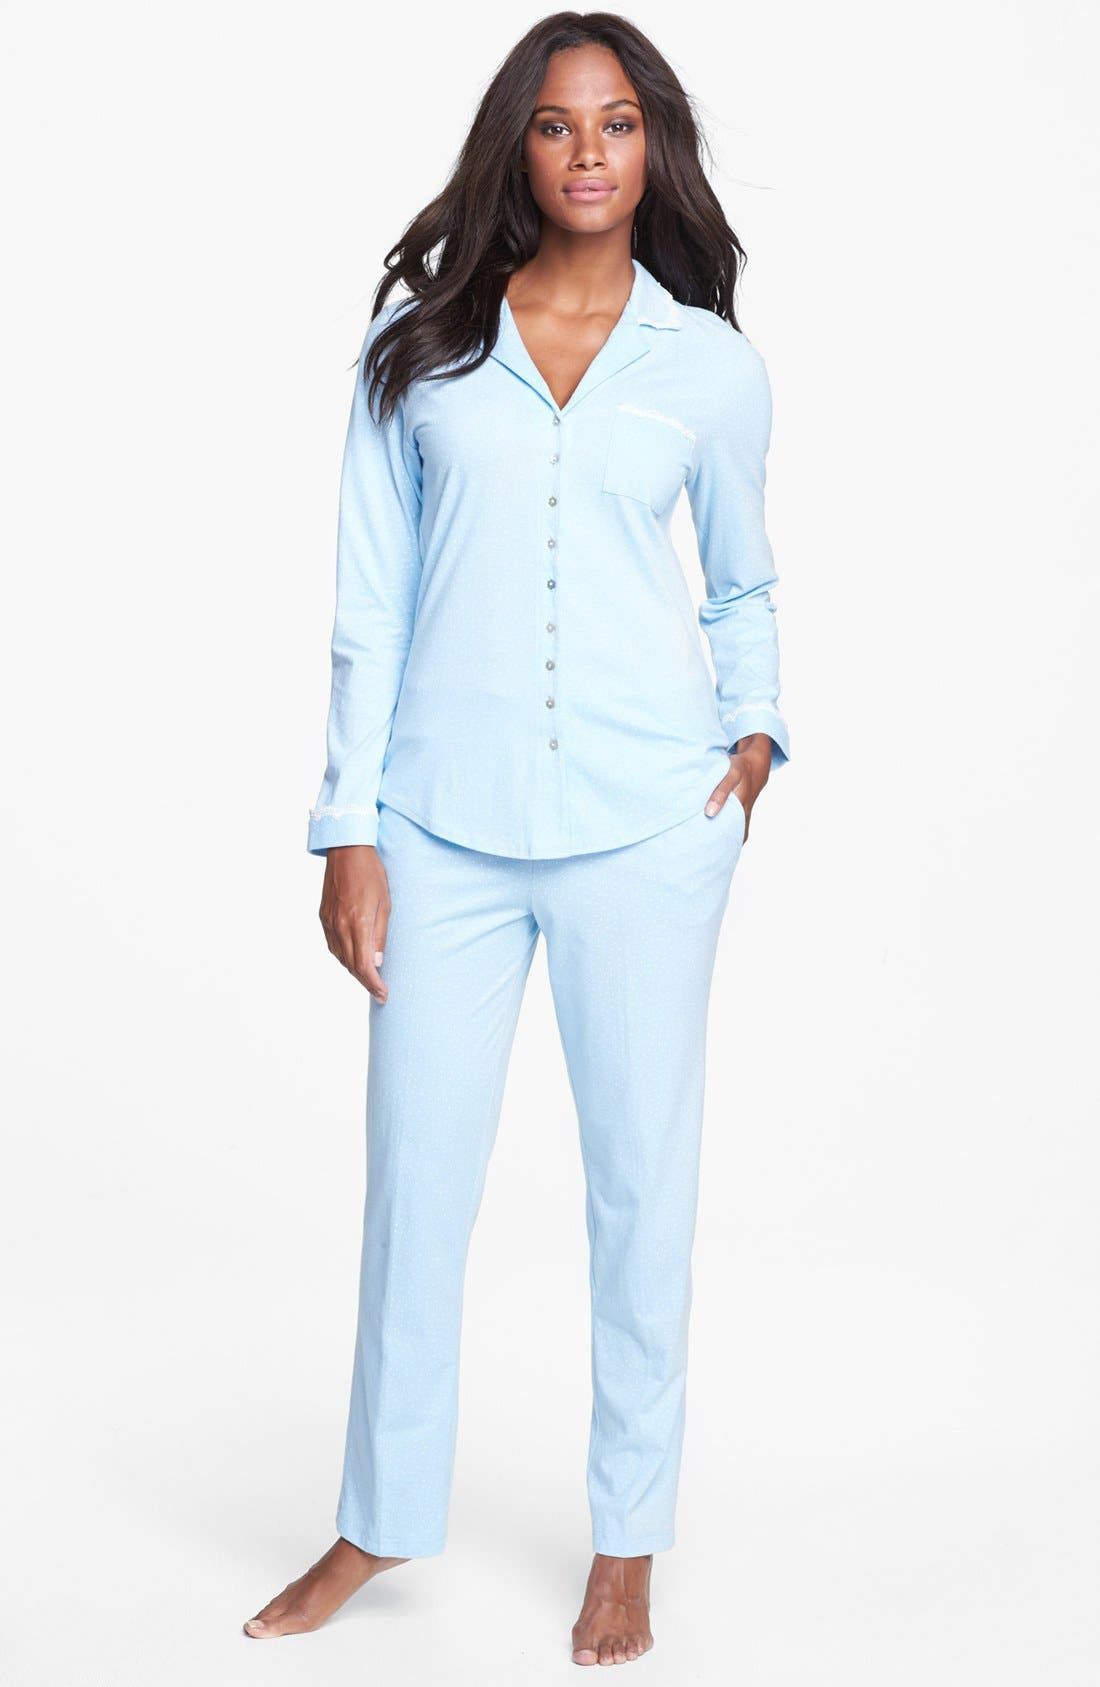 'Buona Notte' Pajamas,                         Main,                         color, Blue/ Winter White Dots